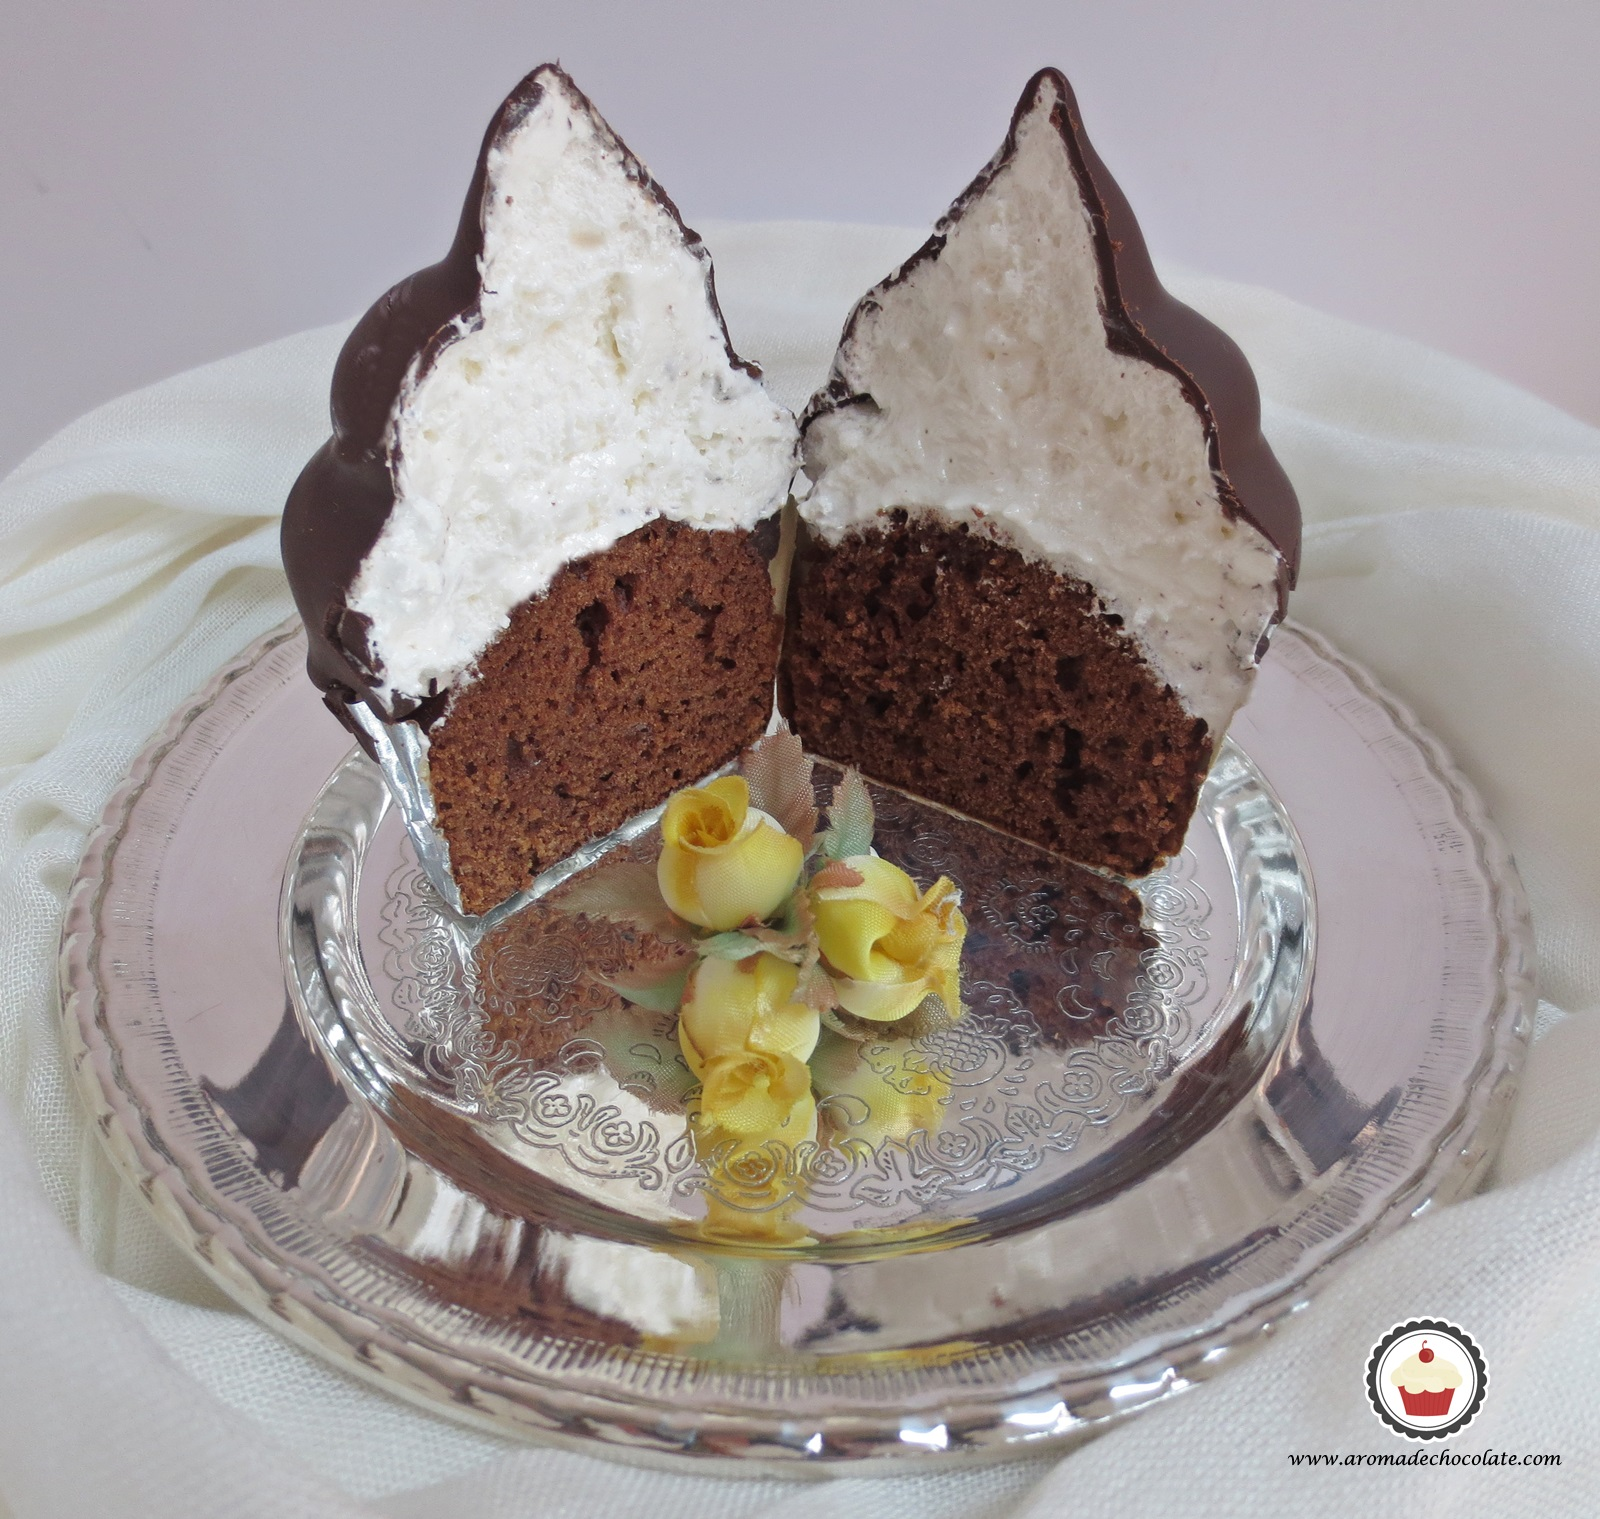 Hi Hat Cupcake cortado. Aroma de chocolate